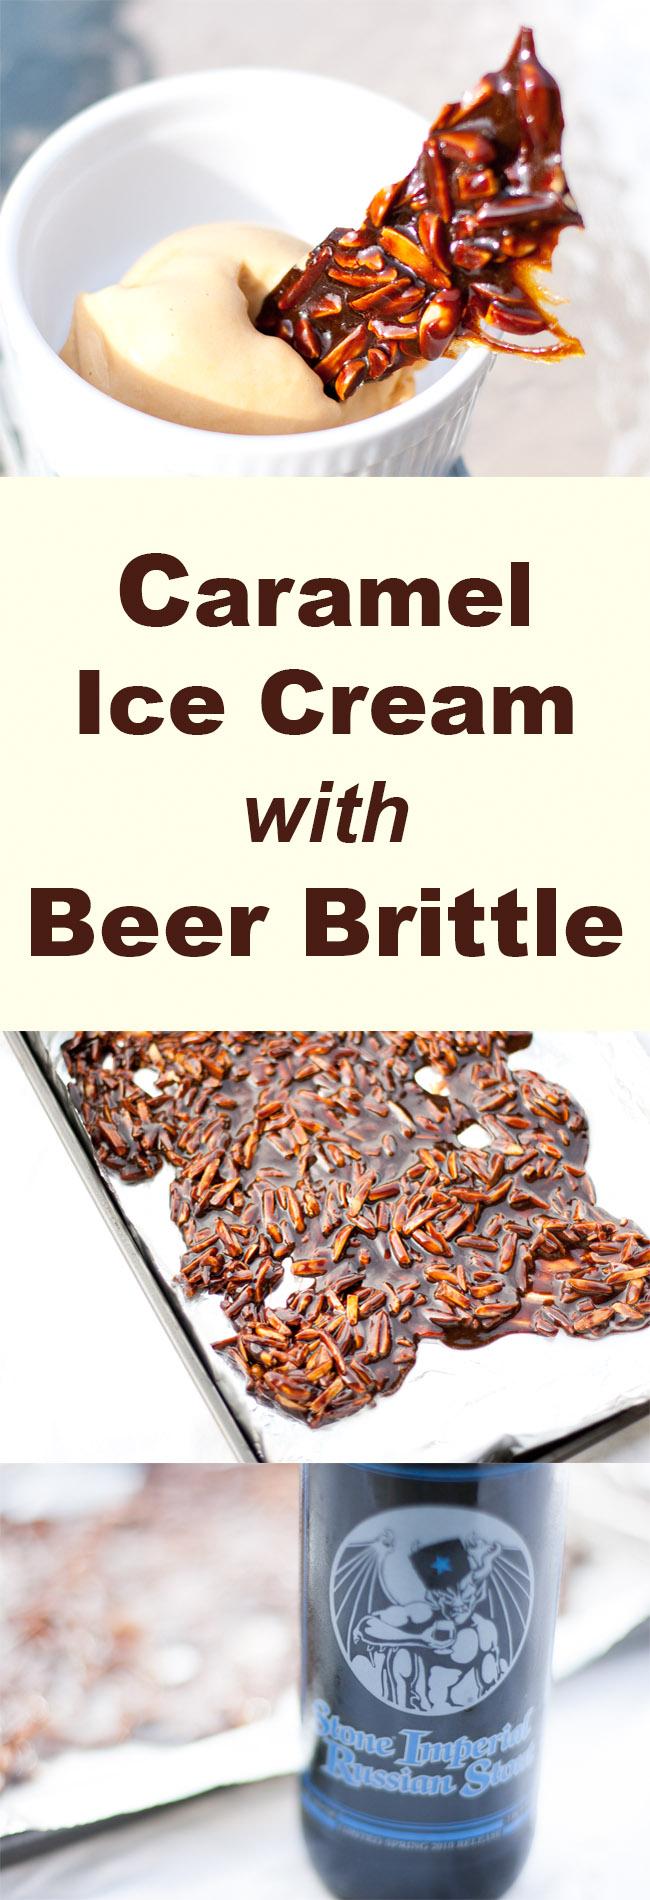 Caramel Ice Cream with Beer Brittle - a creative and fun adult ice cream treat! #dessert #icecream #beer #caramel